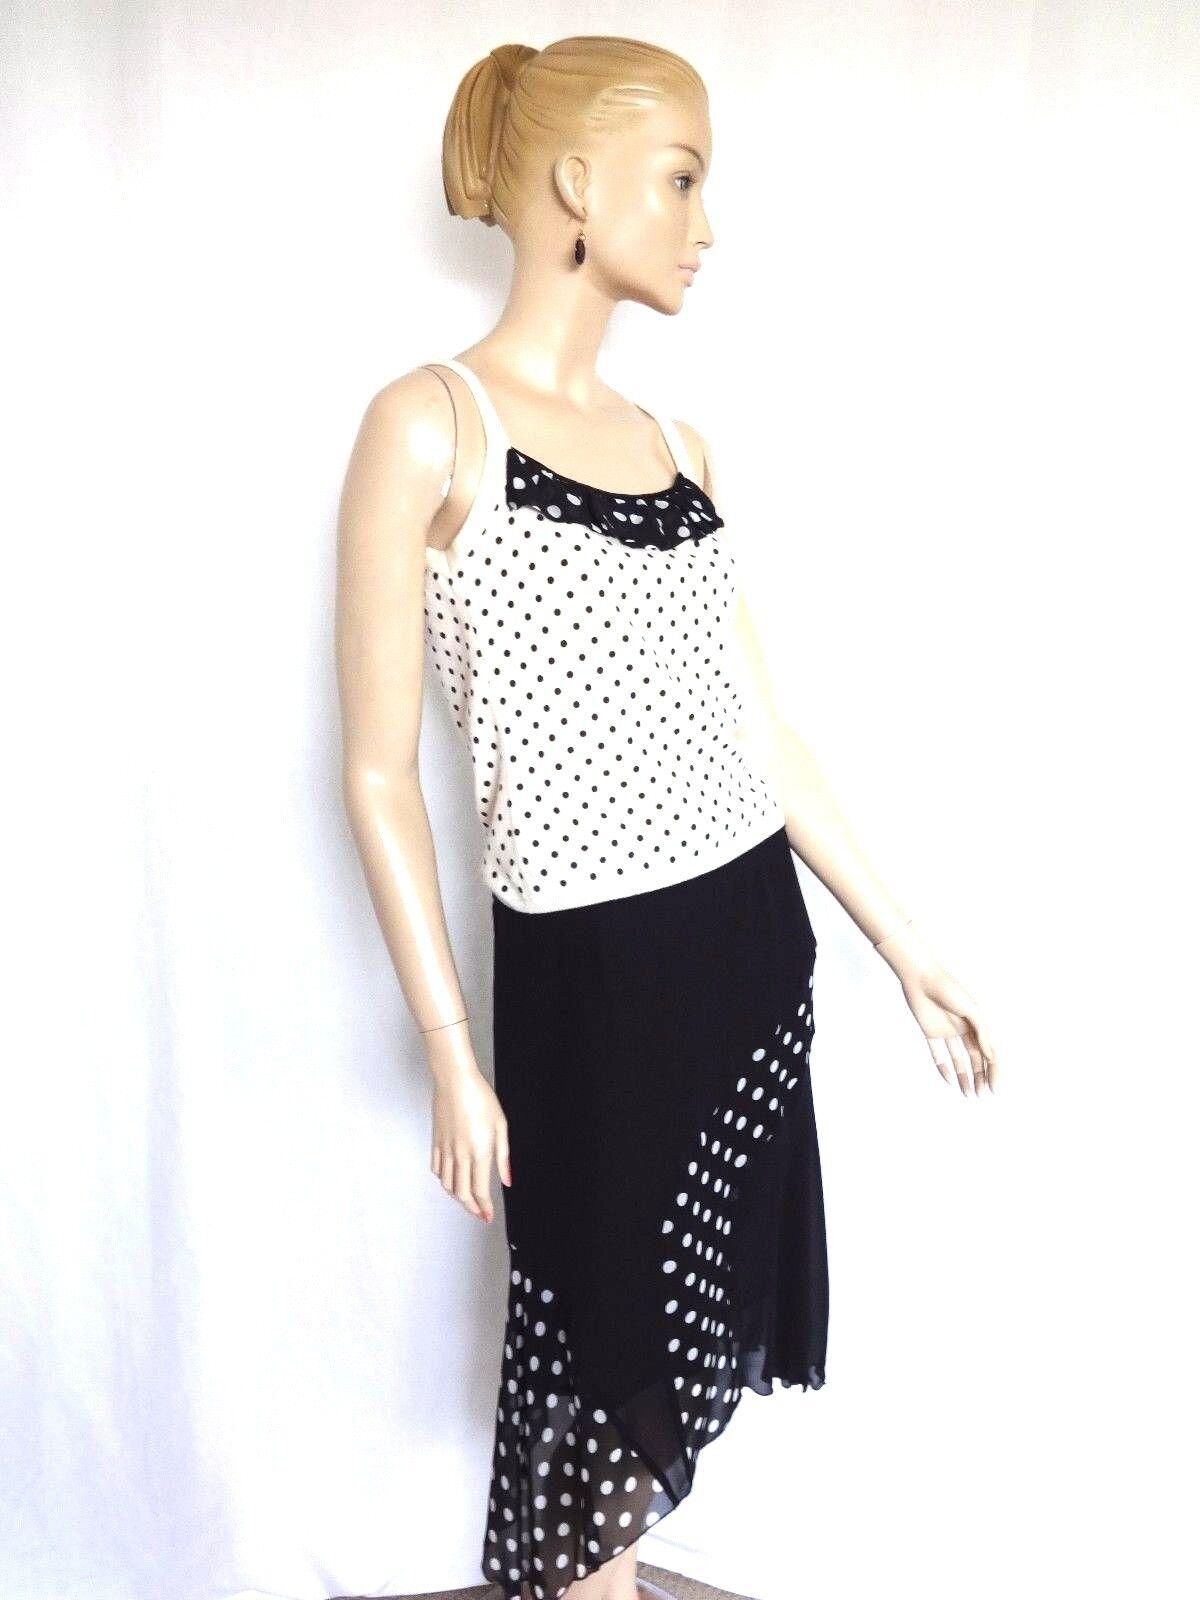 MARIA DI RIPAWeiß  CASHMERE-SILK 2PC DRESS TOP AND SKIRT Größe 8 10